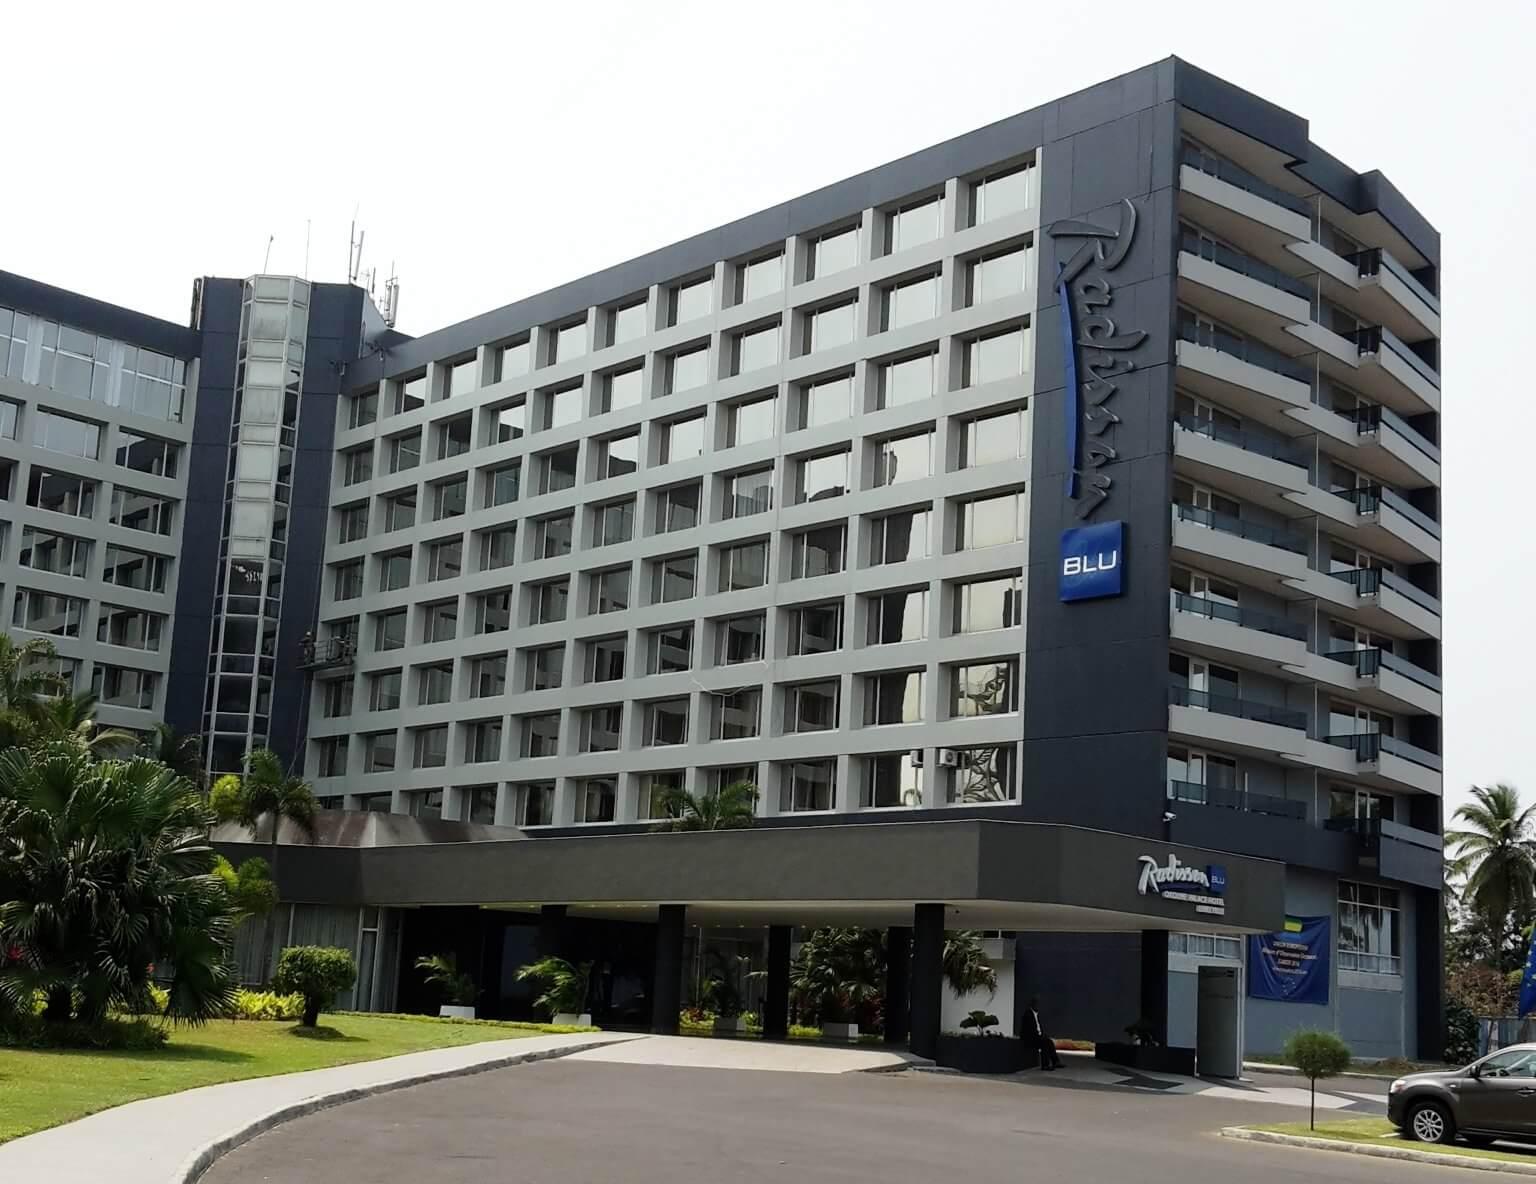 Radisson Blu Okoume Palace Hotel